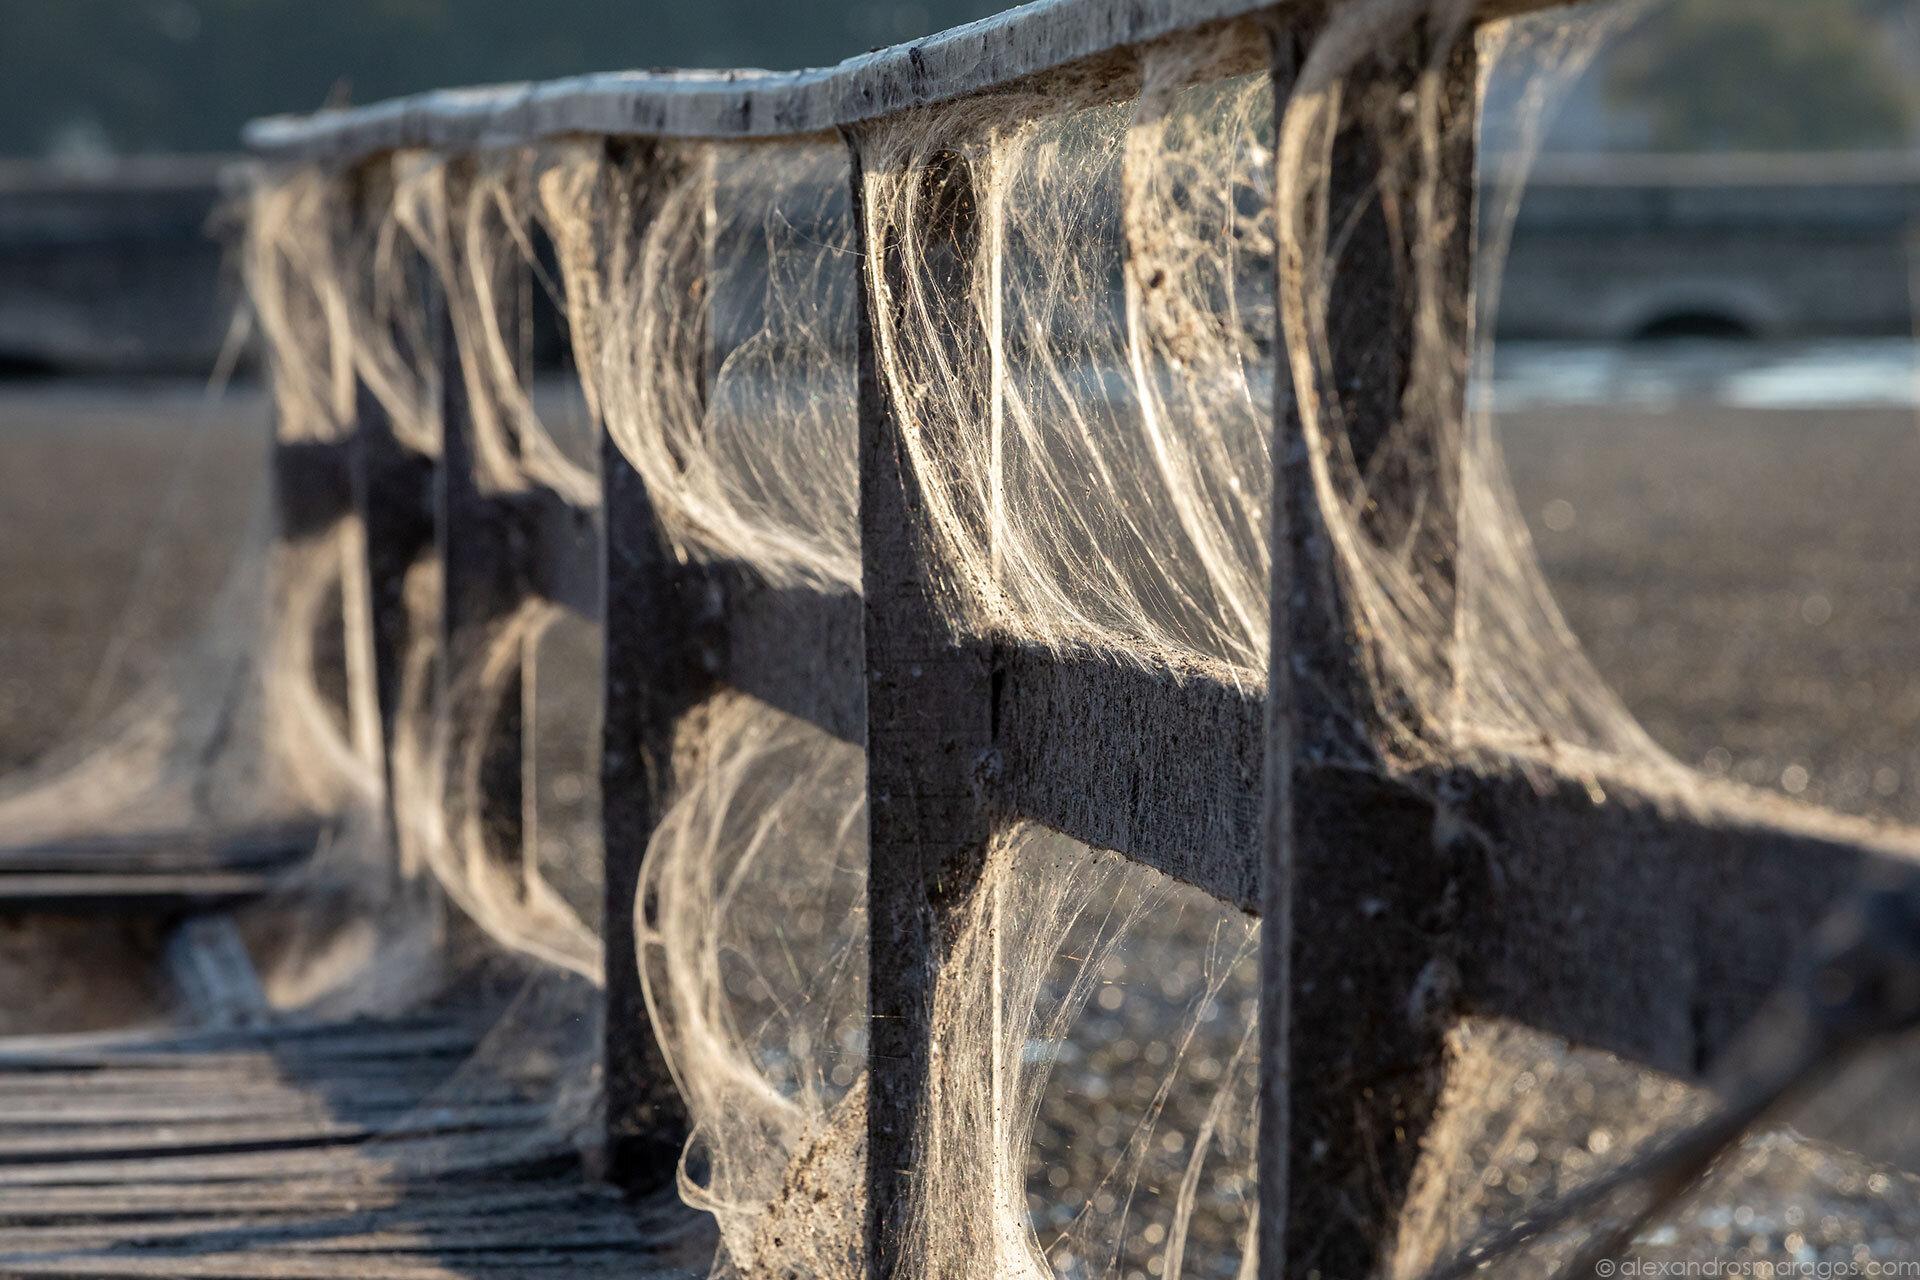 The Aitoliko Spiderweb, Greece